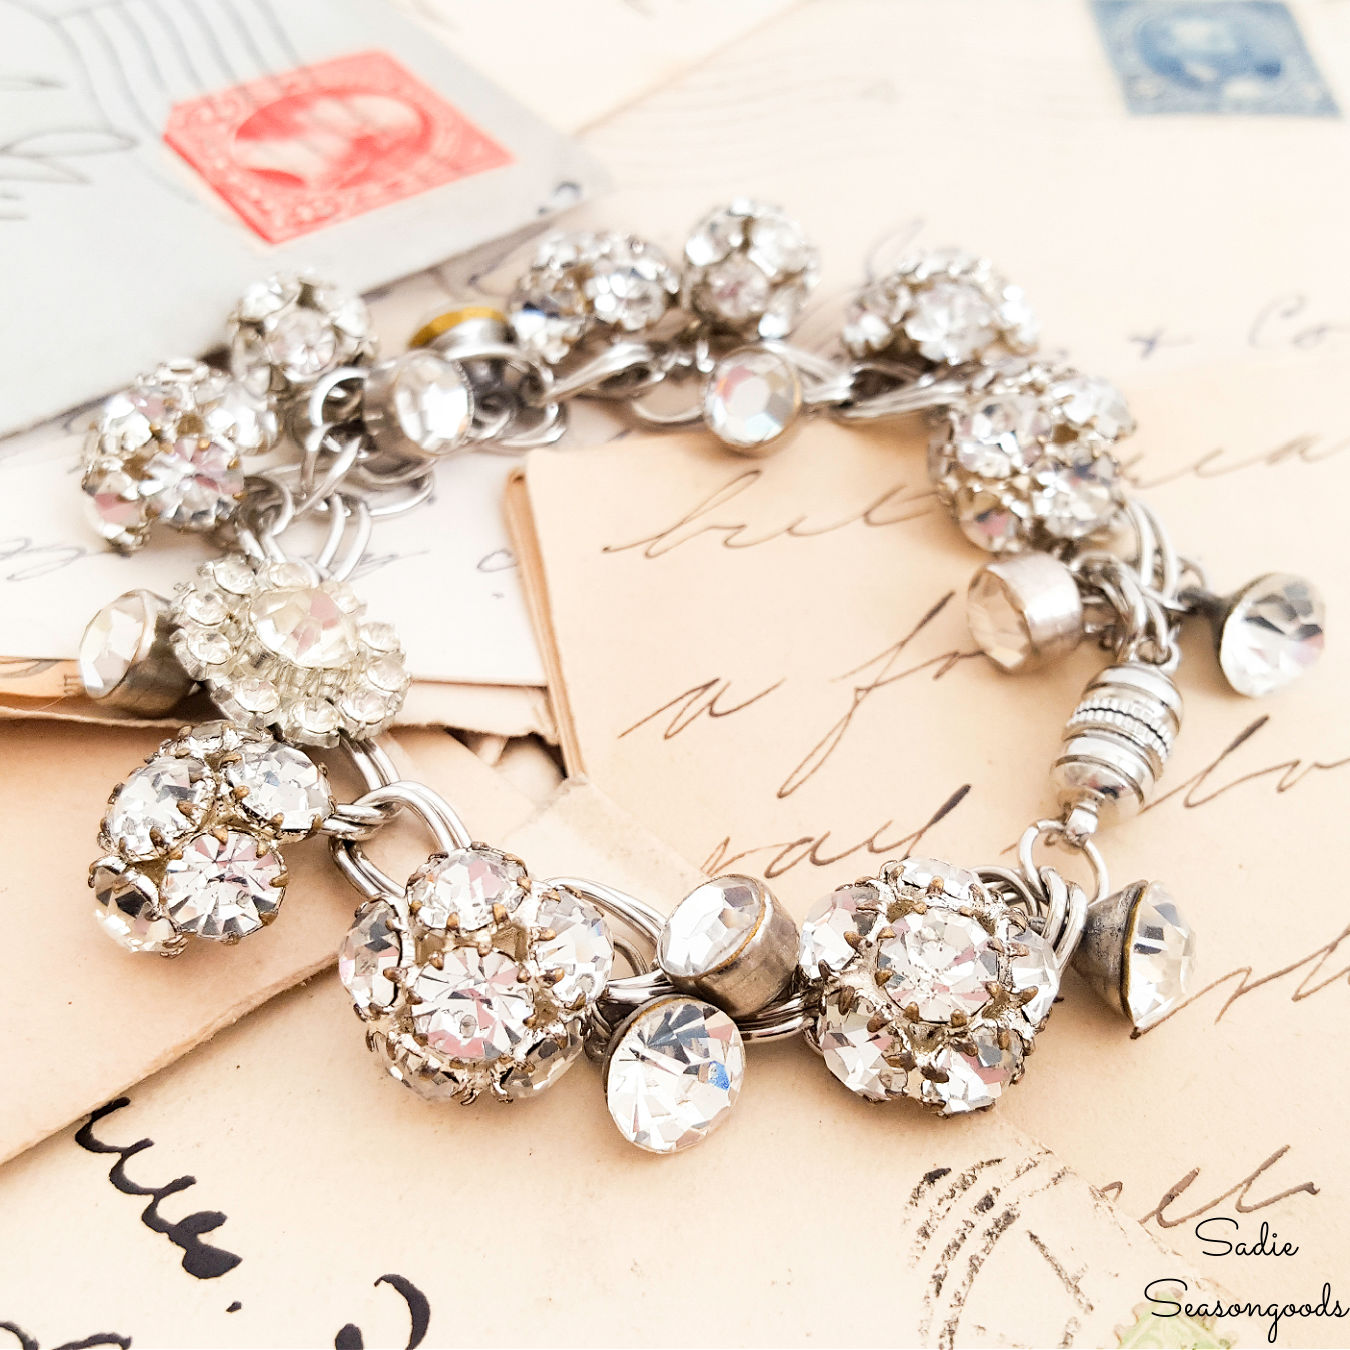 diy charm bracelets from rhinestone buttons